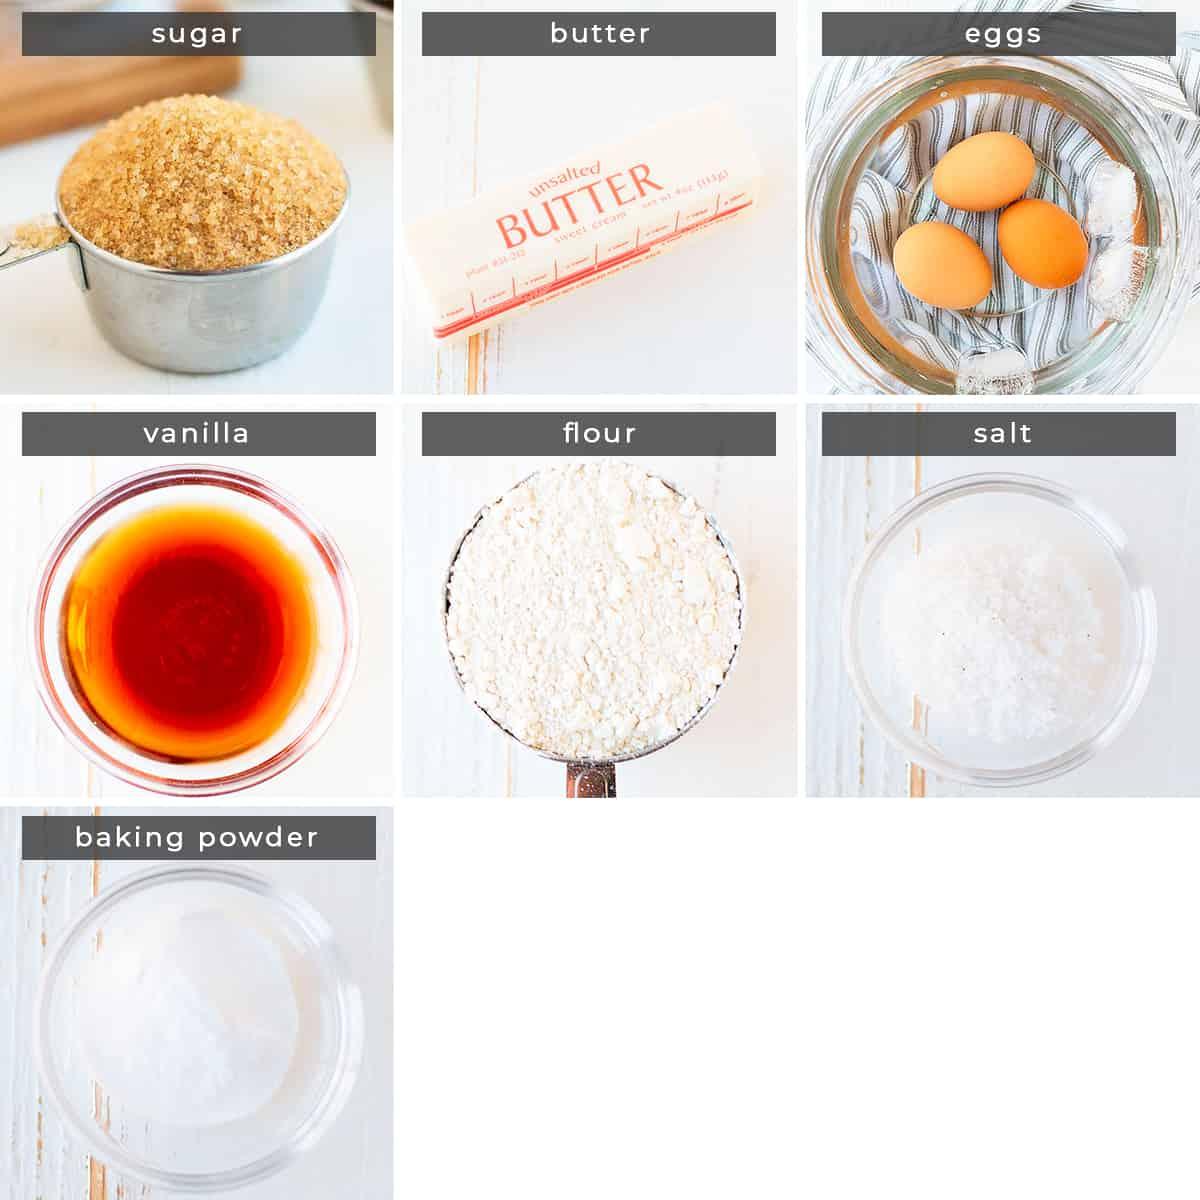 Image containing recipe ingredients sugar, butter, eggs, vanilla, flour, salt, baking powder.